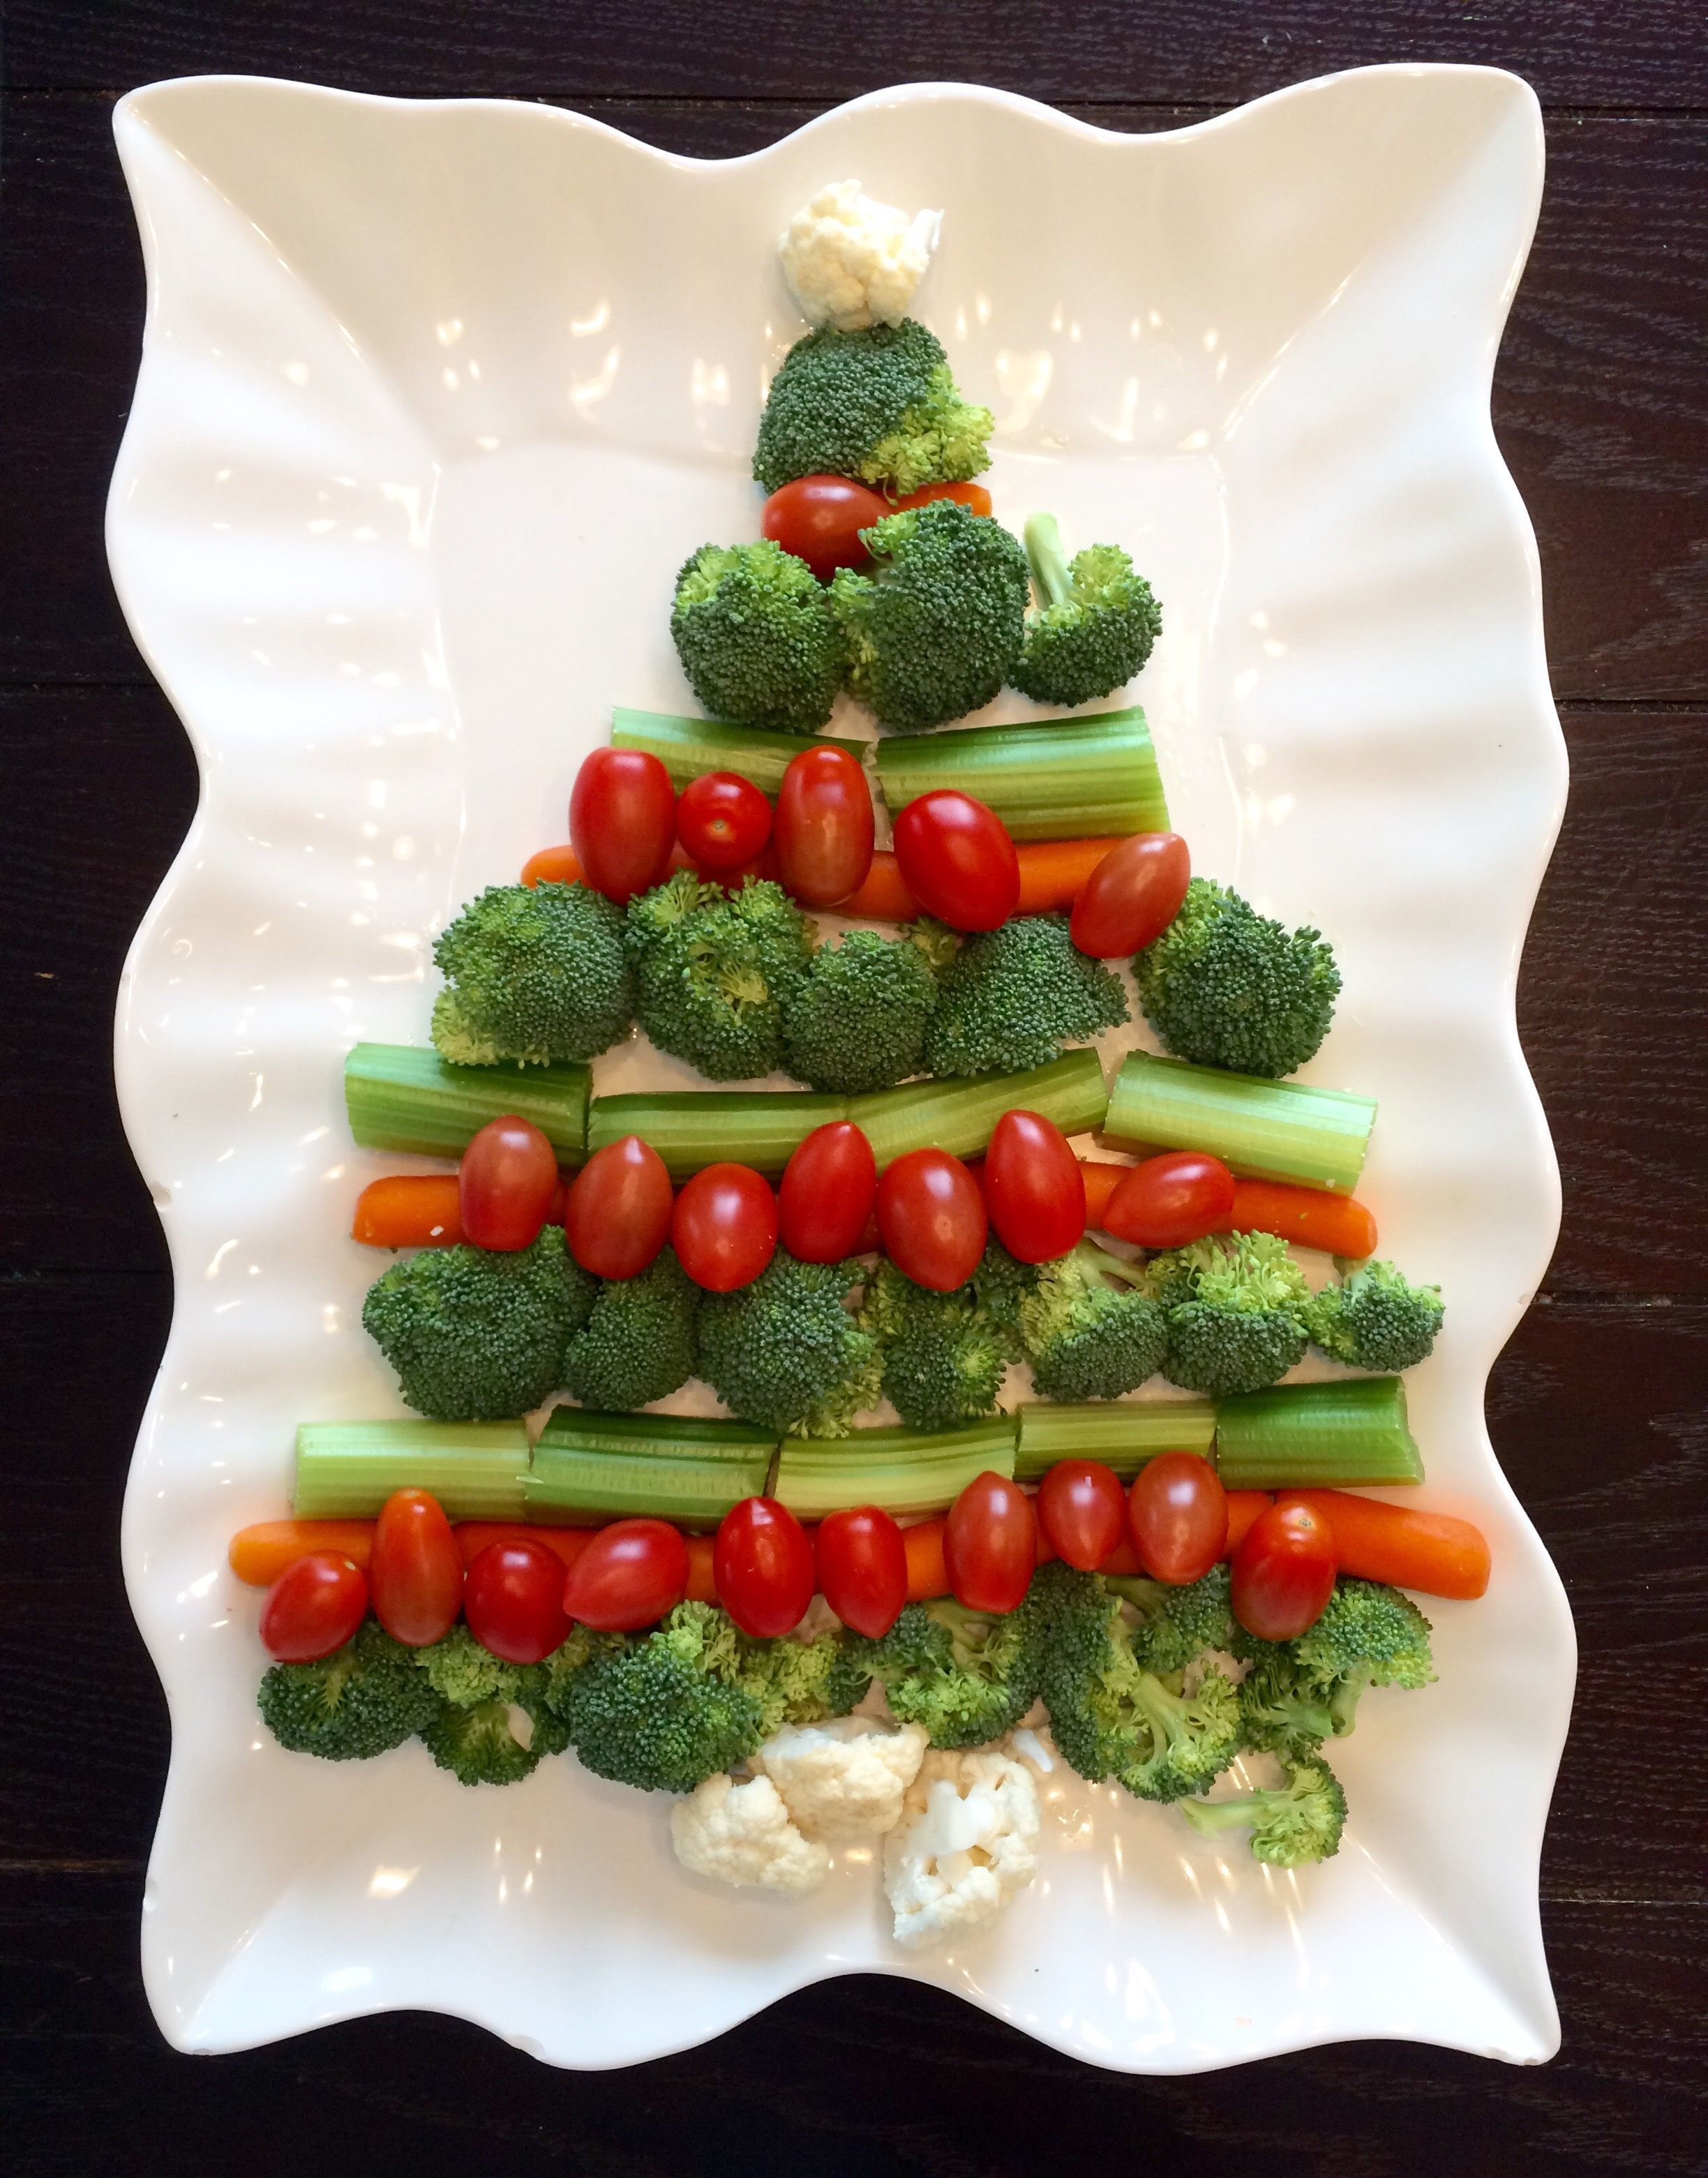 christmas tree veggie tray lou lou girls christmas side dish easy side dish holiday food ideas tips vegetables kids fun food - Christmas Side Dishes Pinterest